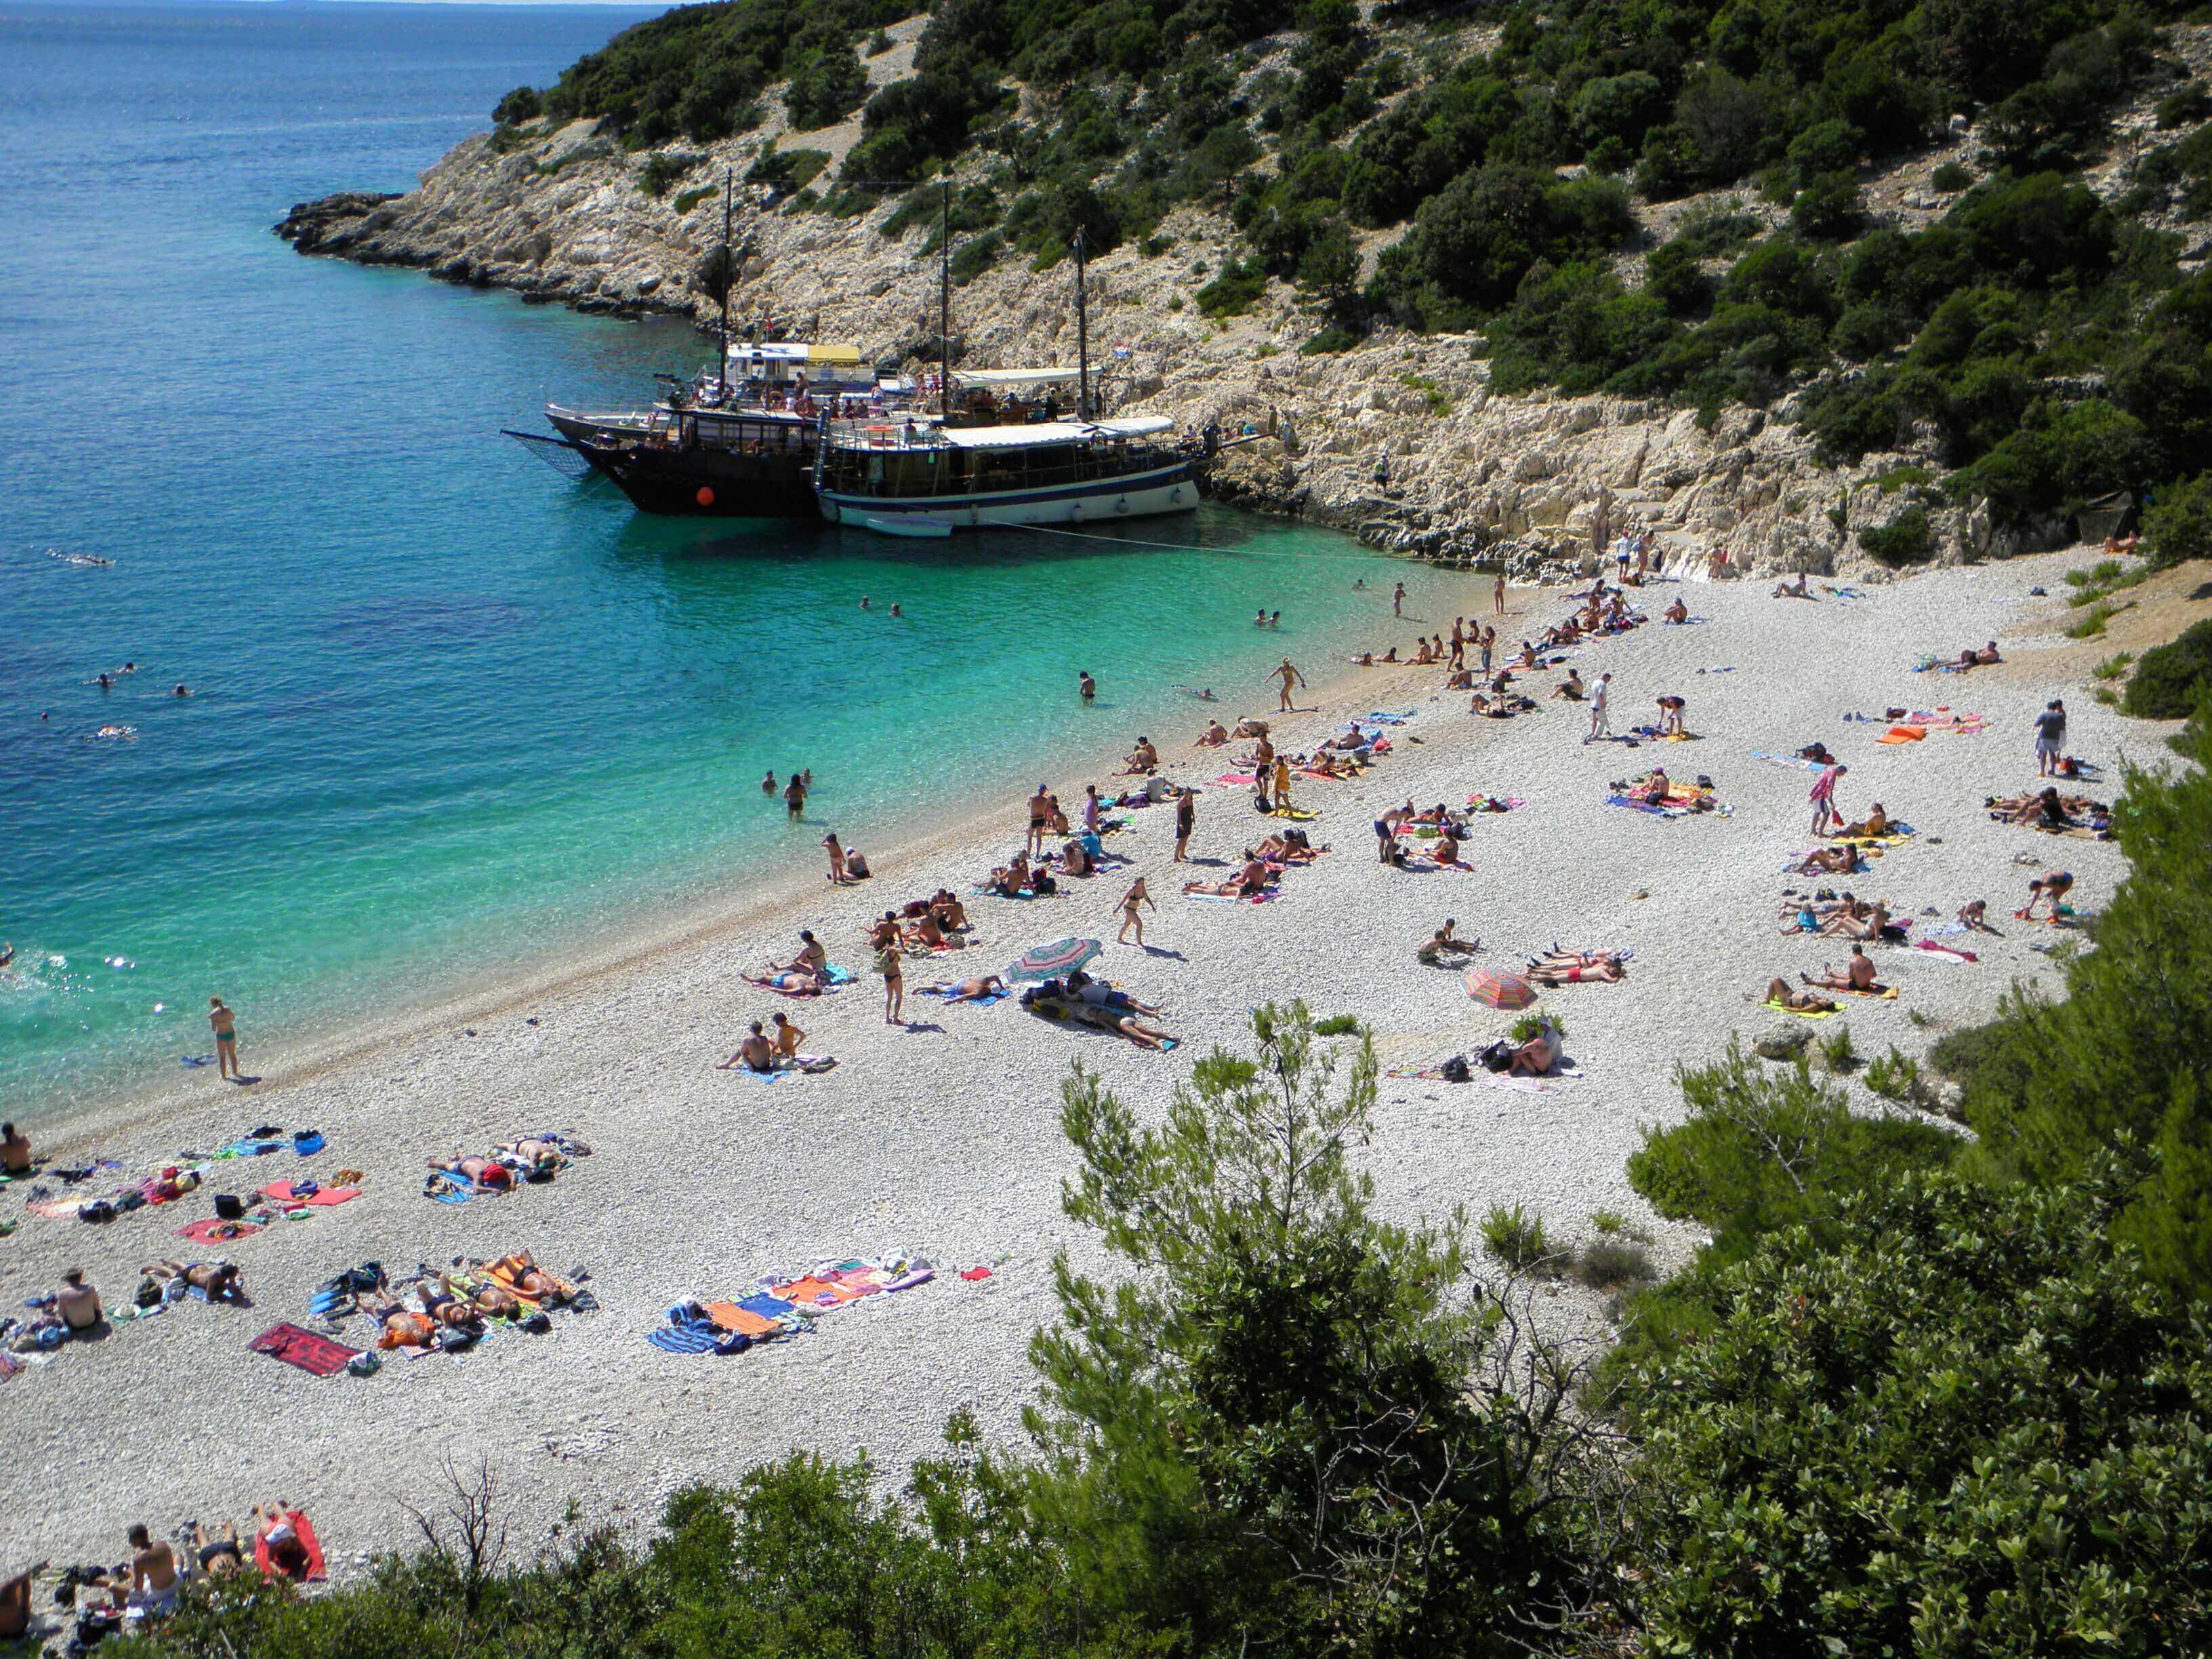 Beste aanlegplaatsen kroatie Mooiste strand europa, Lubenice  strand Cres Boot huren kroatie, vaarvakantie kroatie, zeilvakantie kroatie, beste aanlegplaatsen kroatie, catamaran huren kroatie, bootverhuur kroatie, zeilboot huren kroatie,